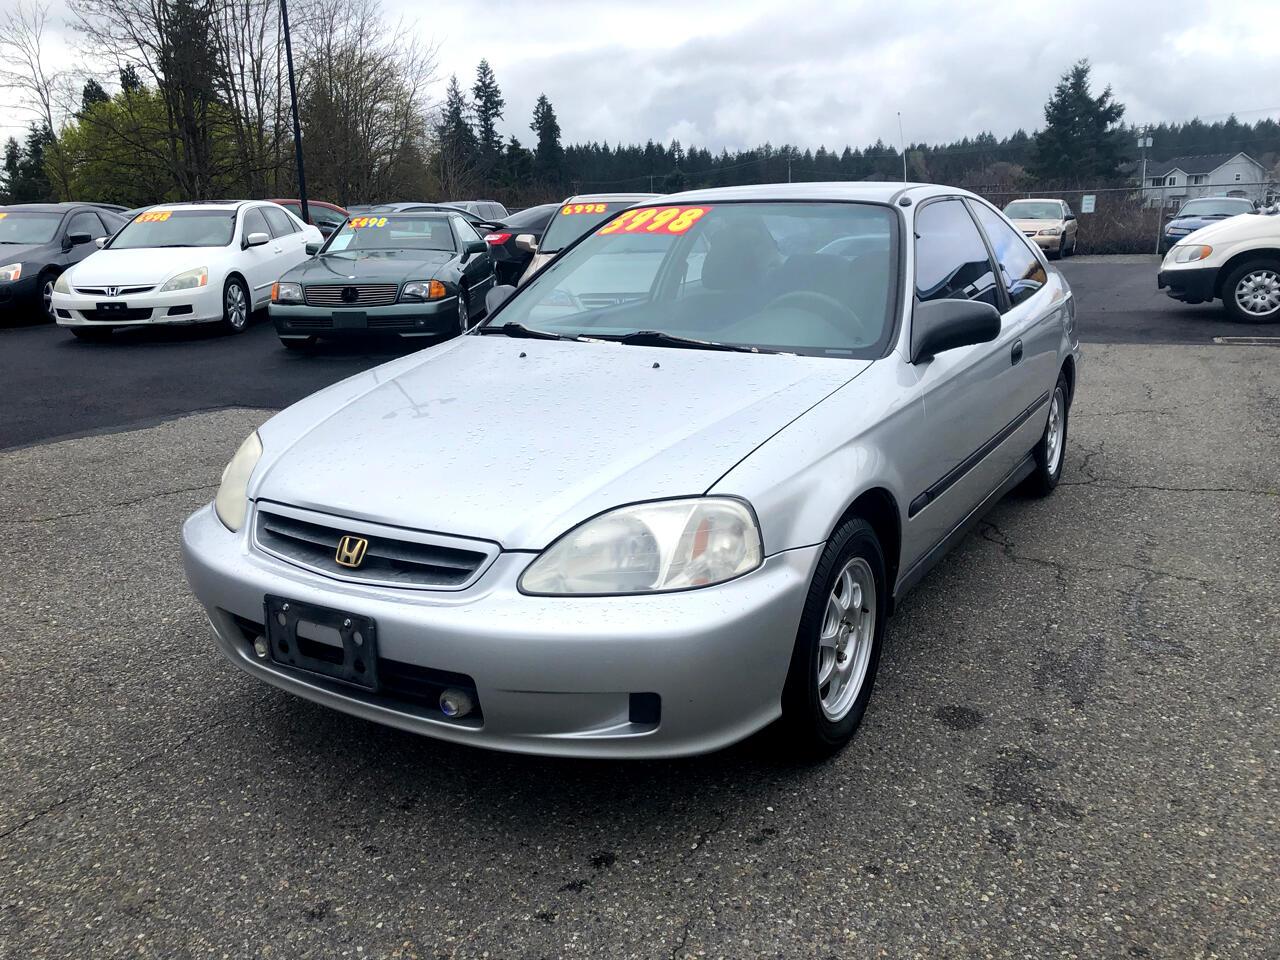 2000 Honda Civic HX coupe